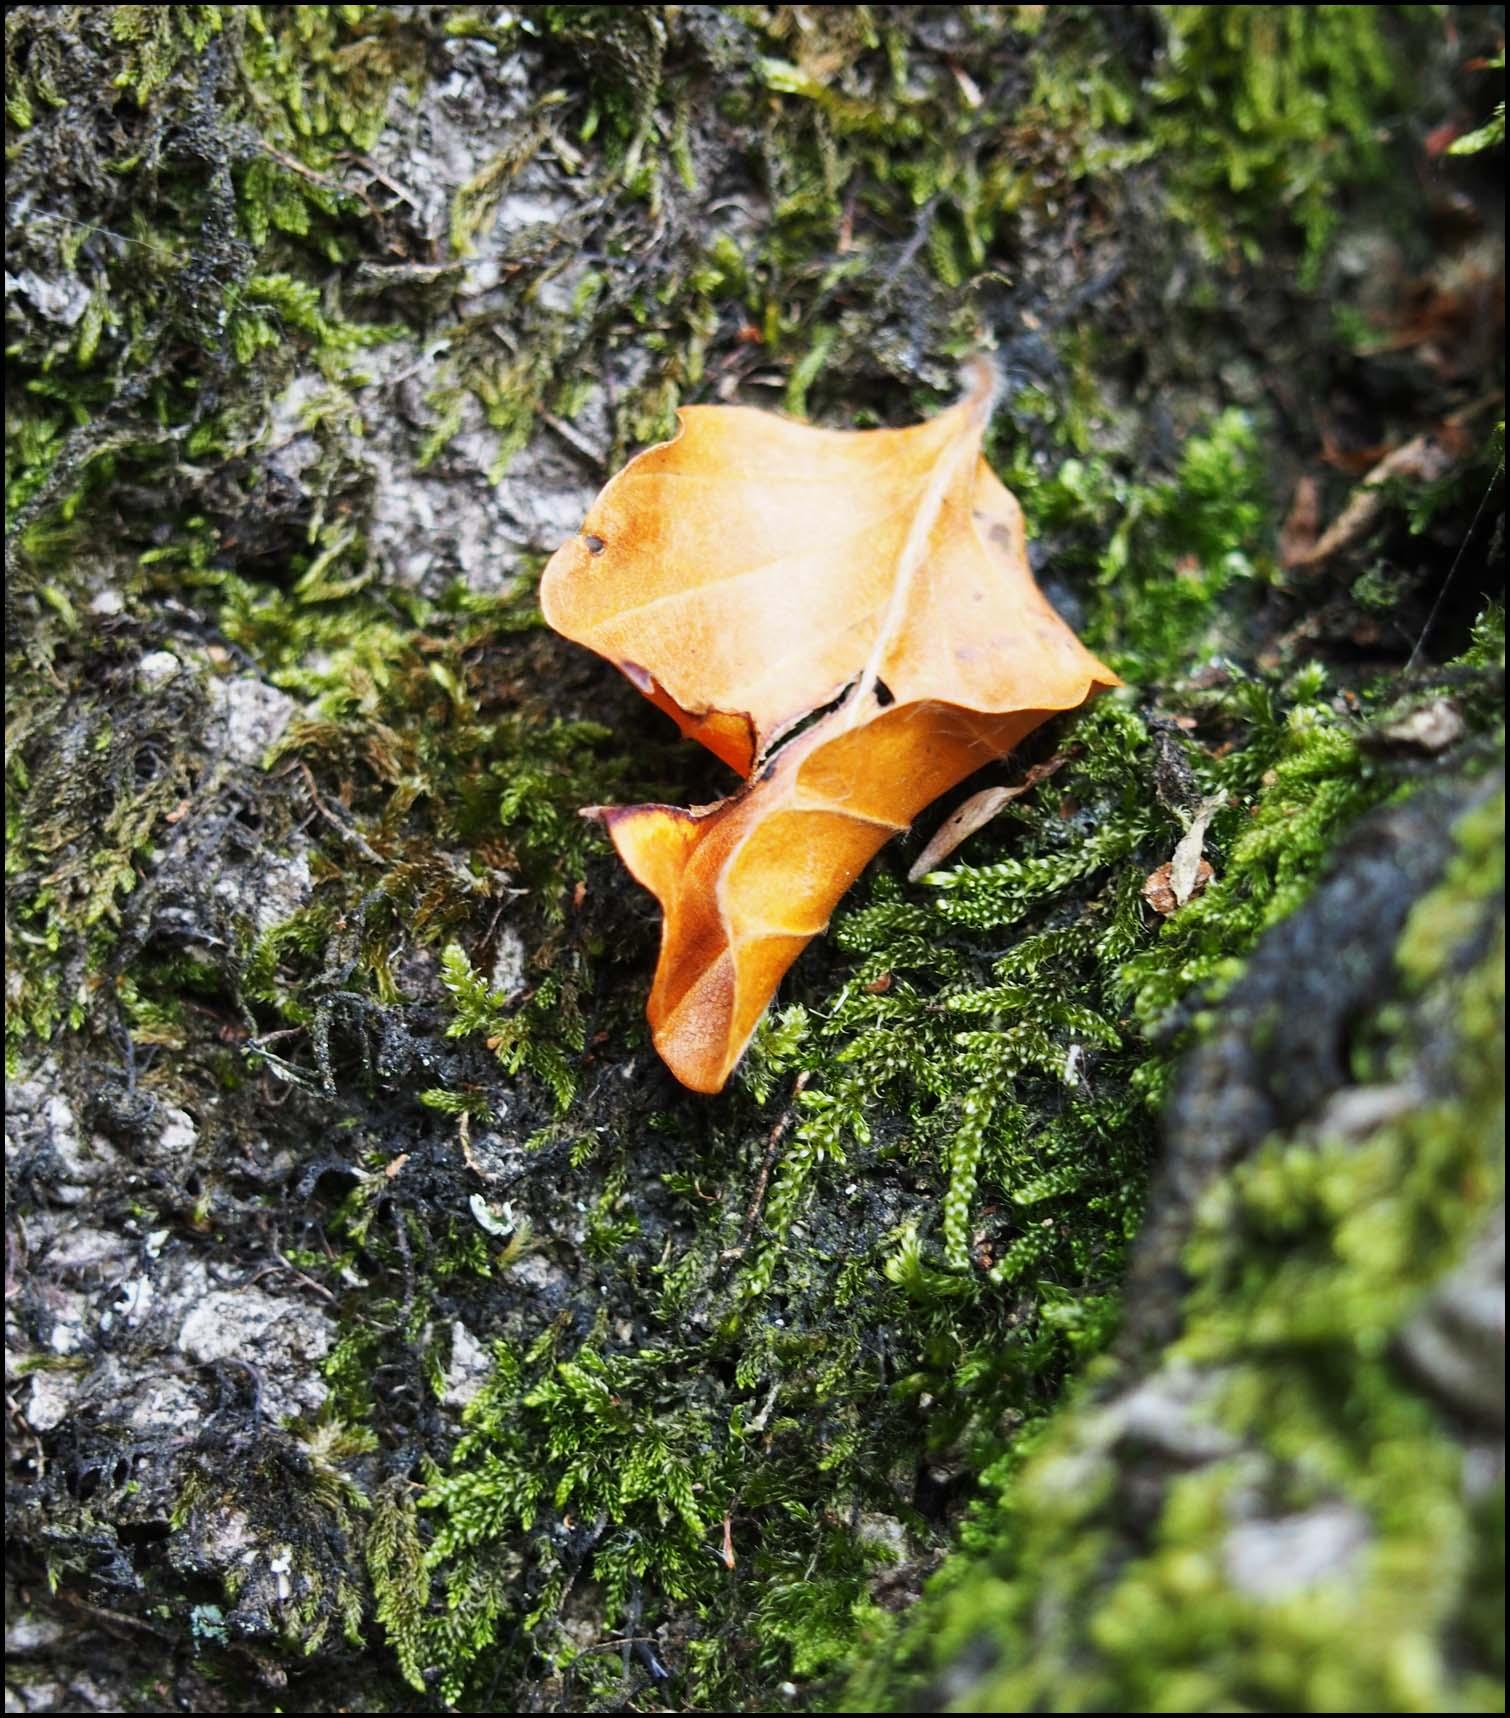 A leaf and moss